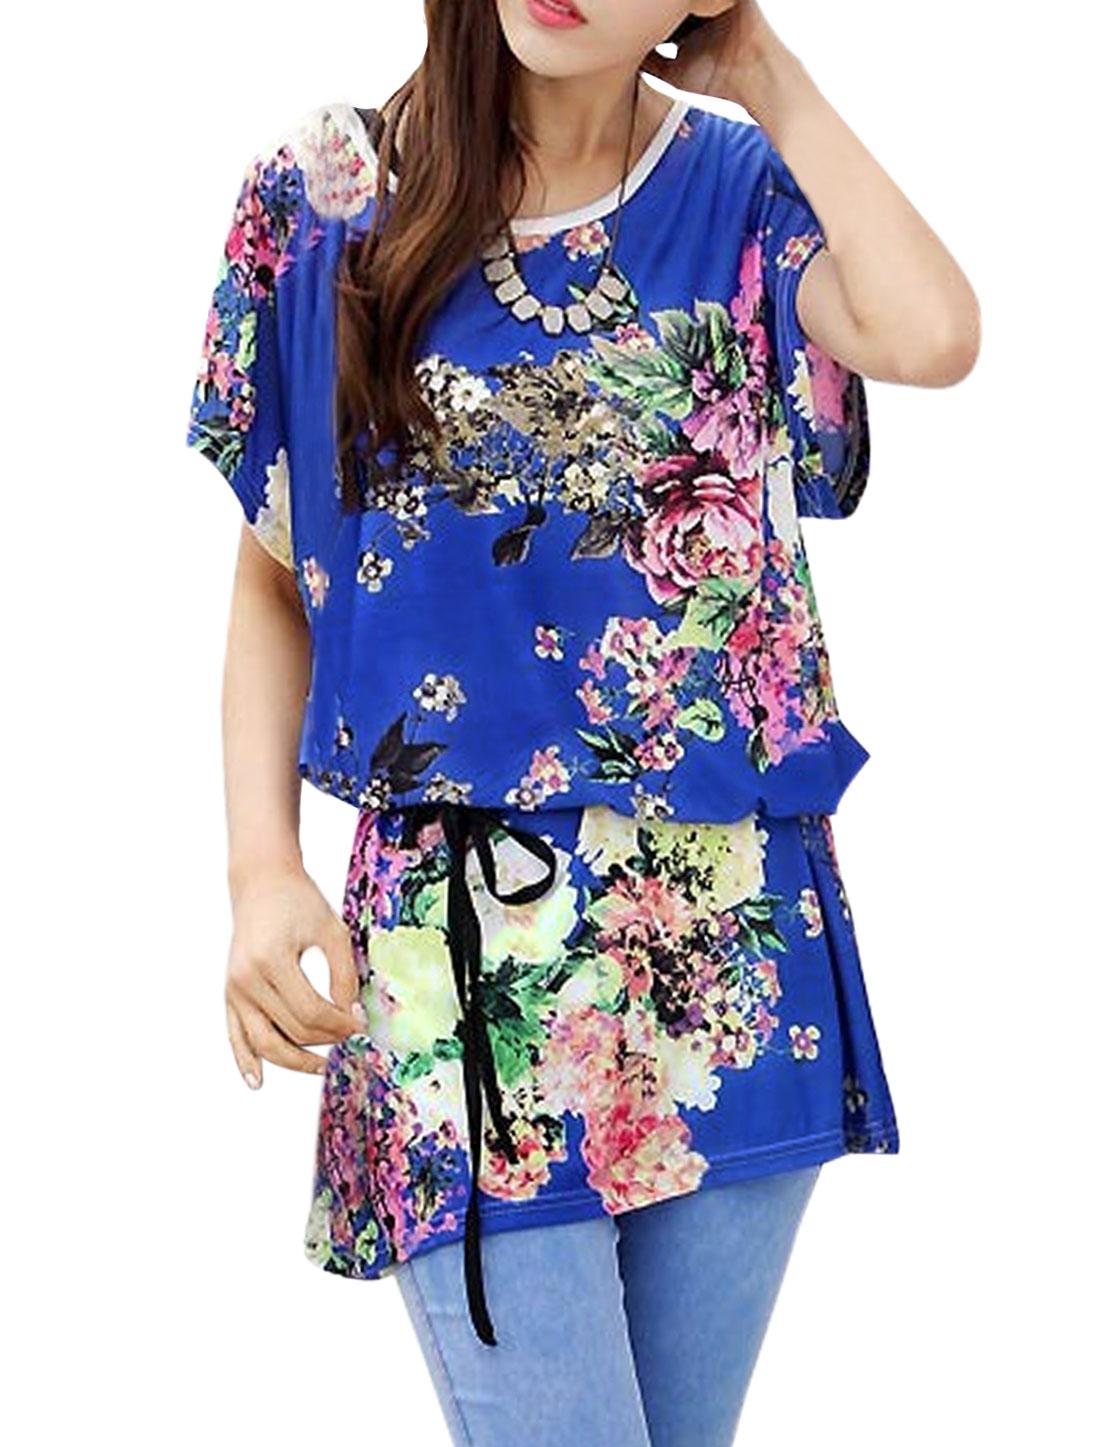 Ladies Short Sleeves Tunic Floral Tops w Waist Belt Blue M